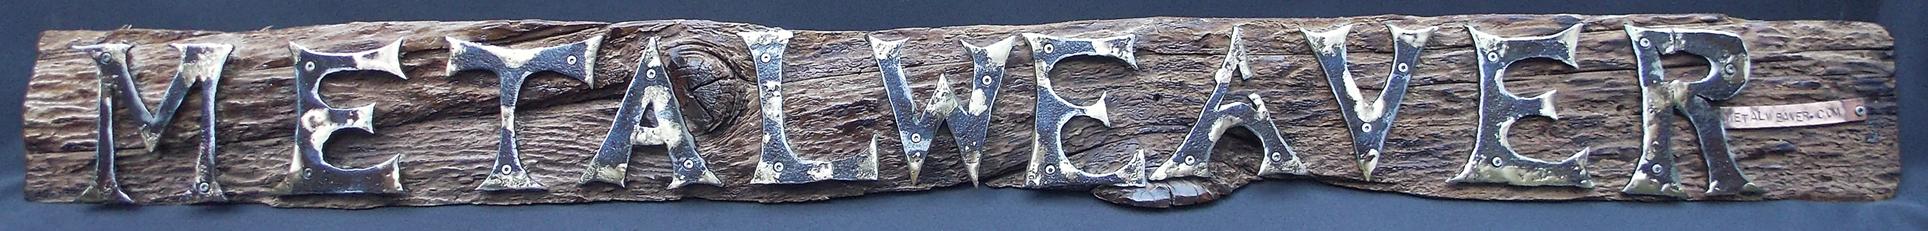 metalweaver